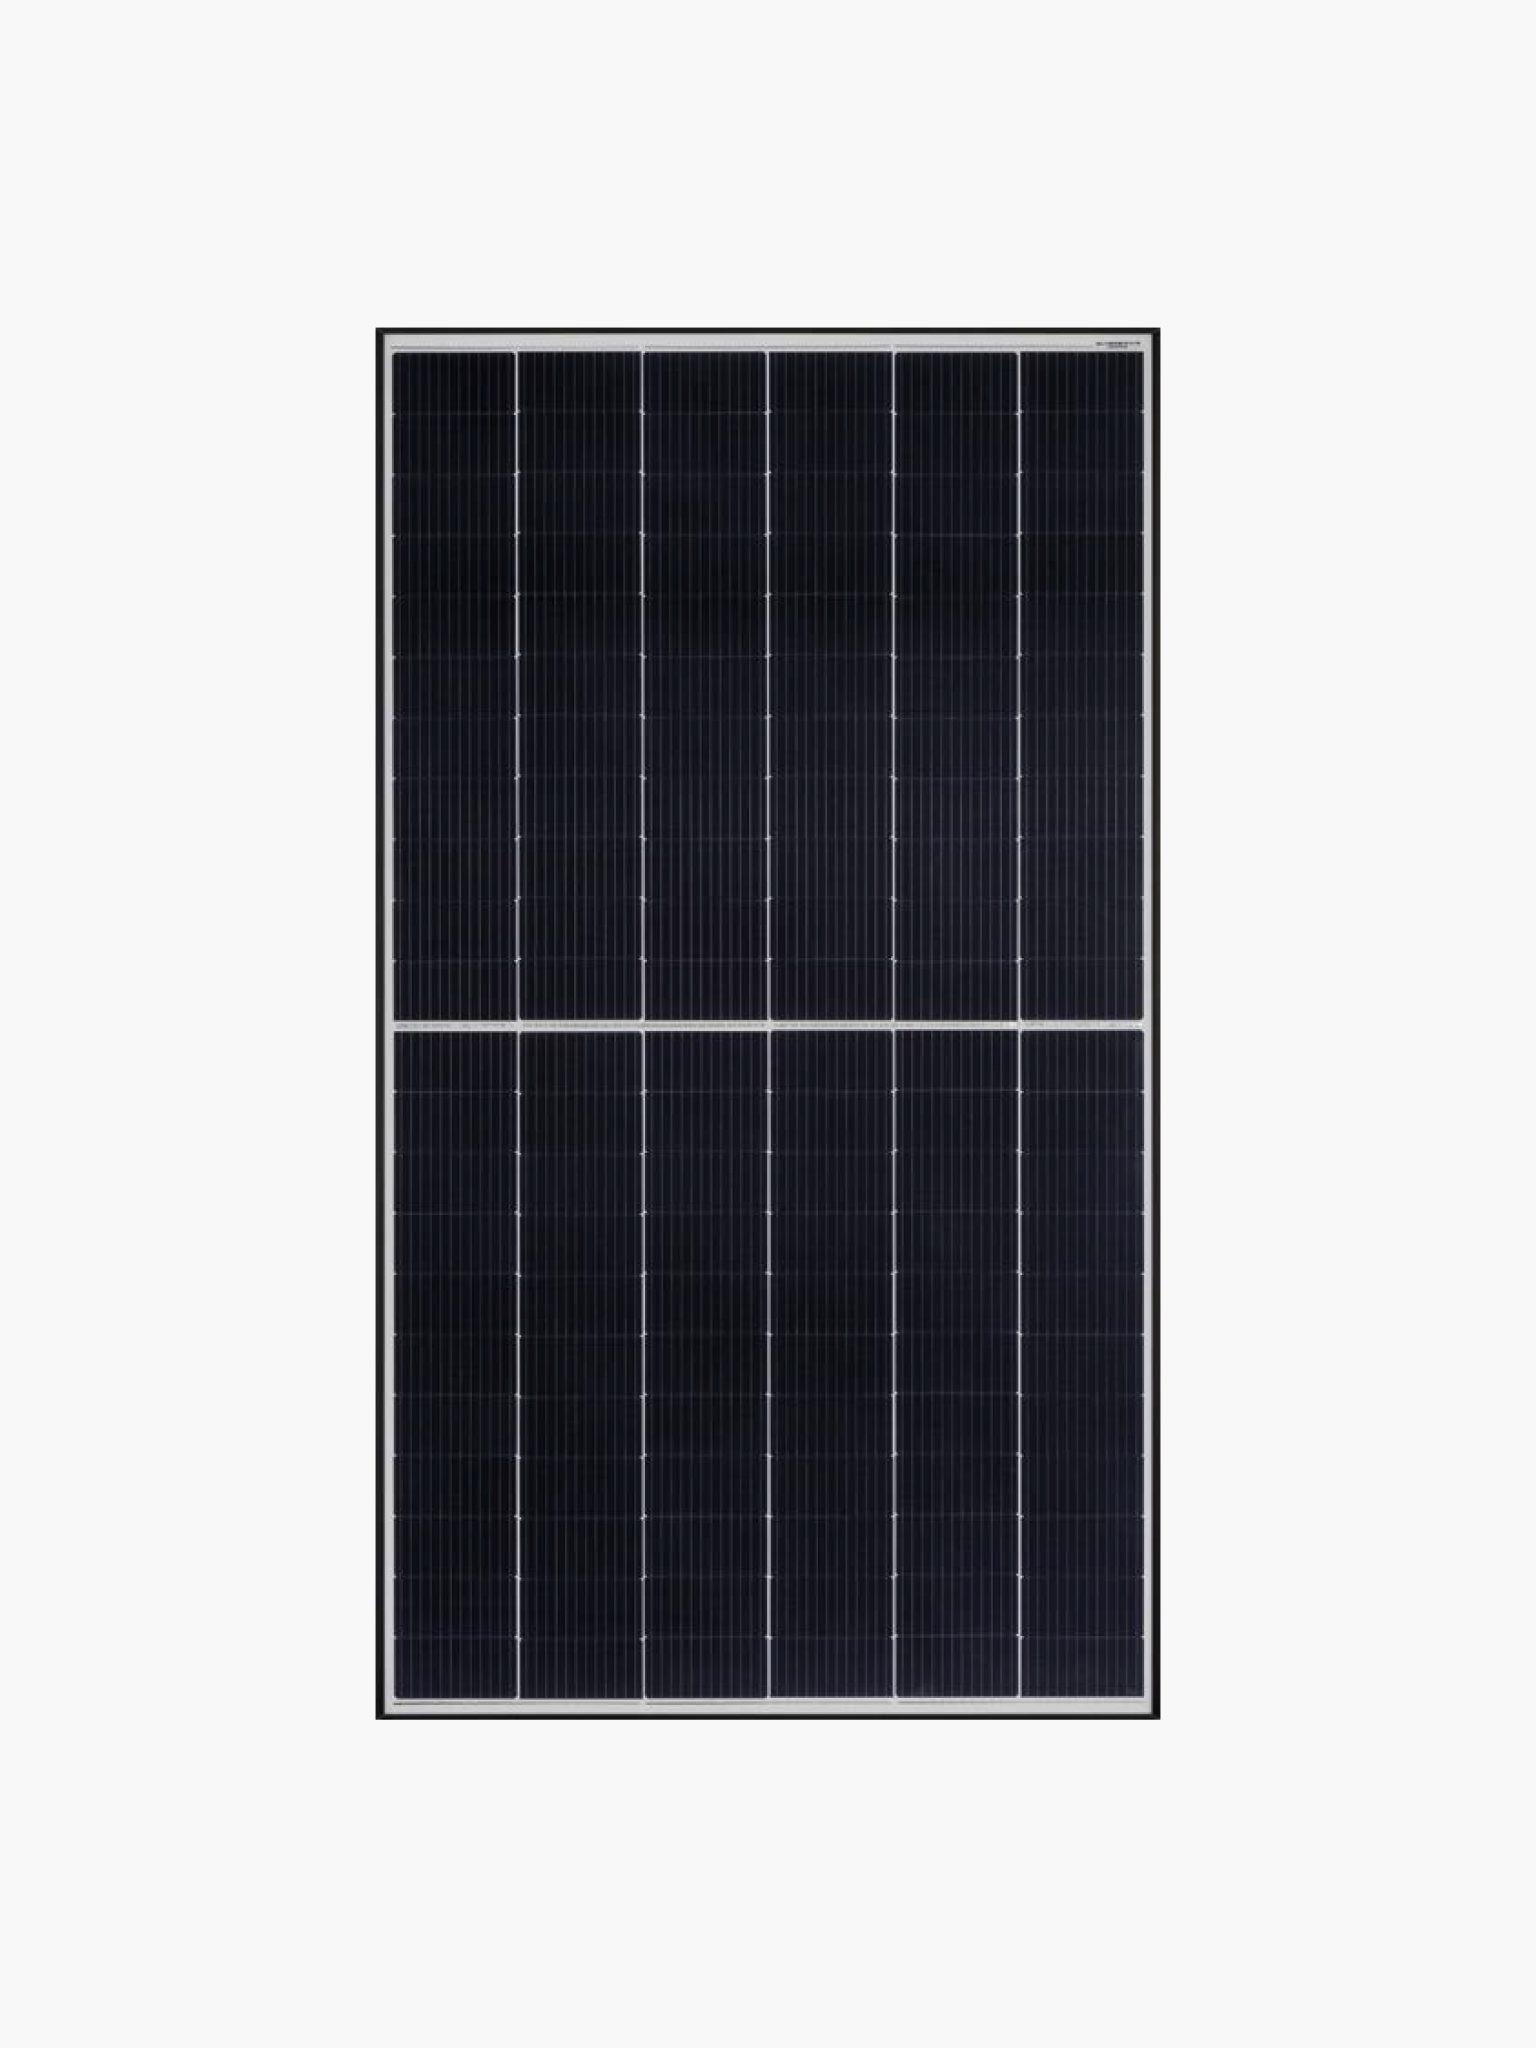 Green House Solutions zonnepanelen batterijopslag laadpalen airconditioning 000003 1